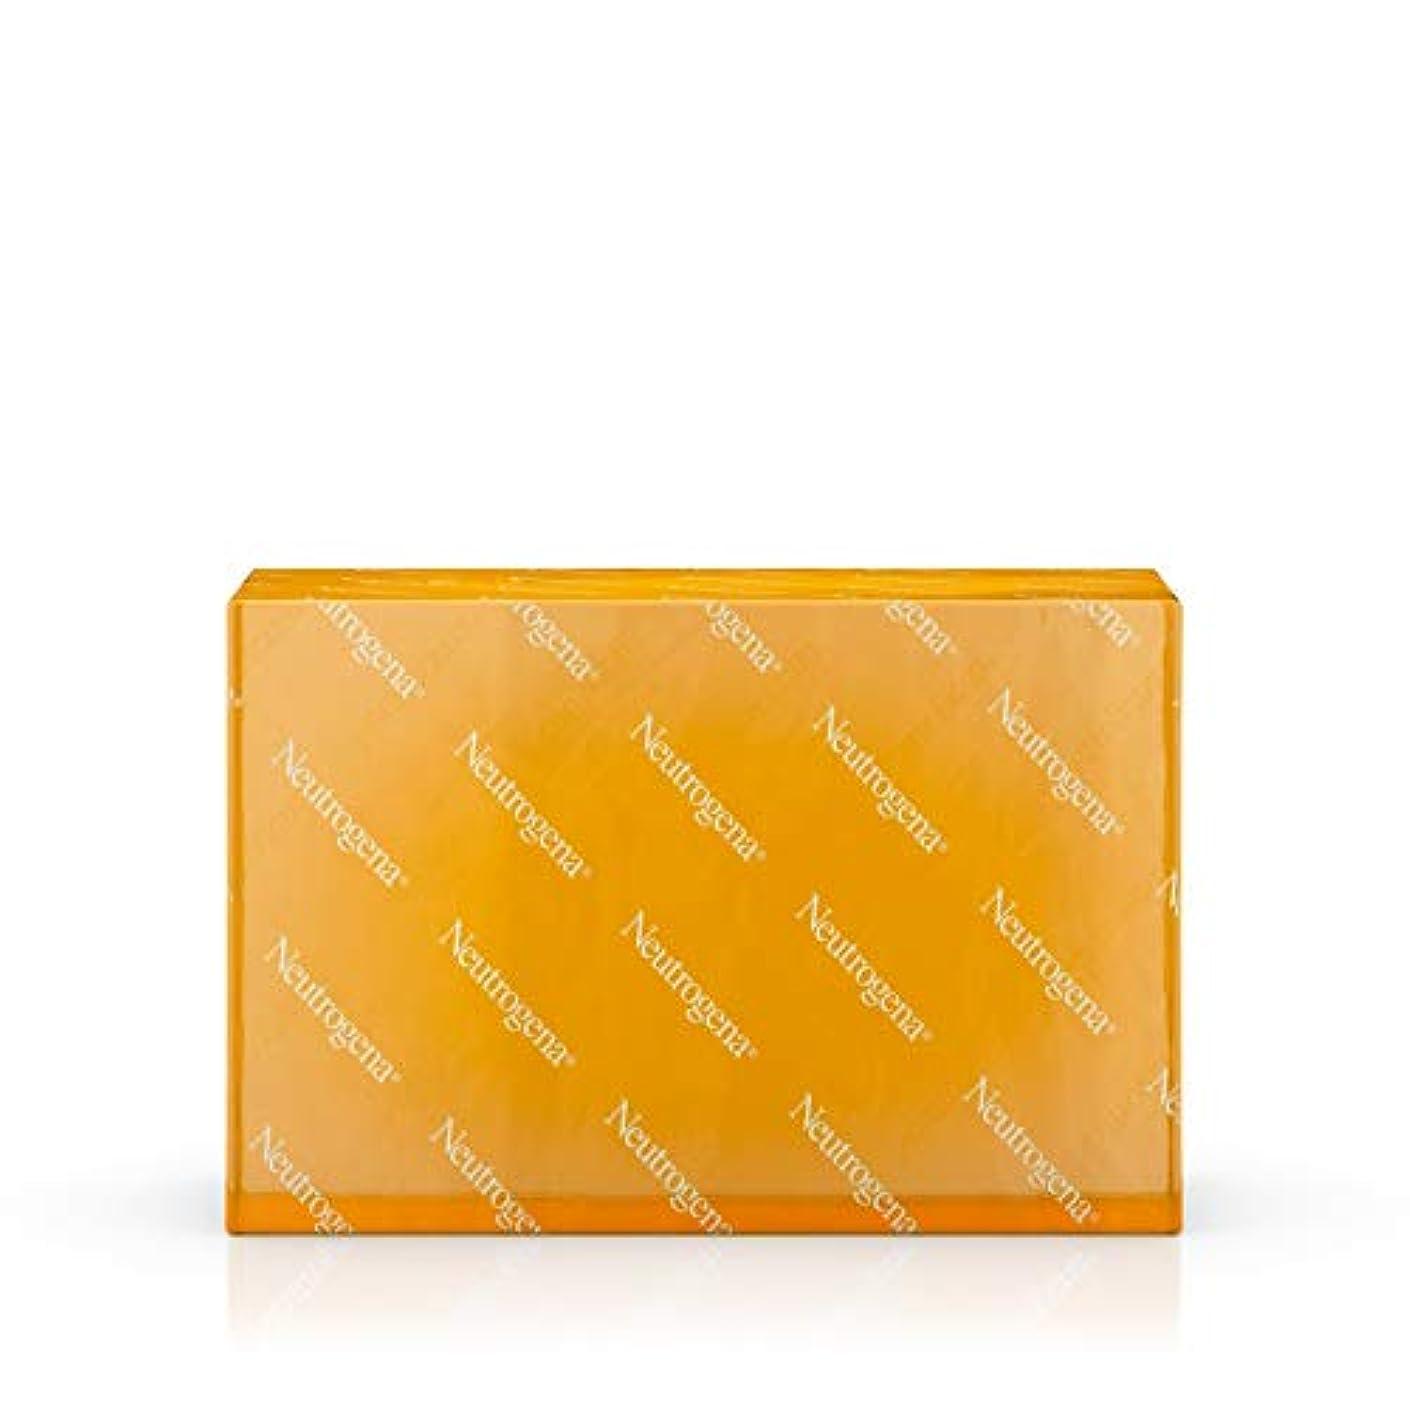 捕虜算術反毒海外直送品 Neutrogena Neutrogena Transparent Facial Bar Soap Fragrance Free, Fragrance Free 3.5 oz